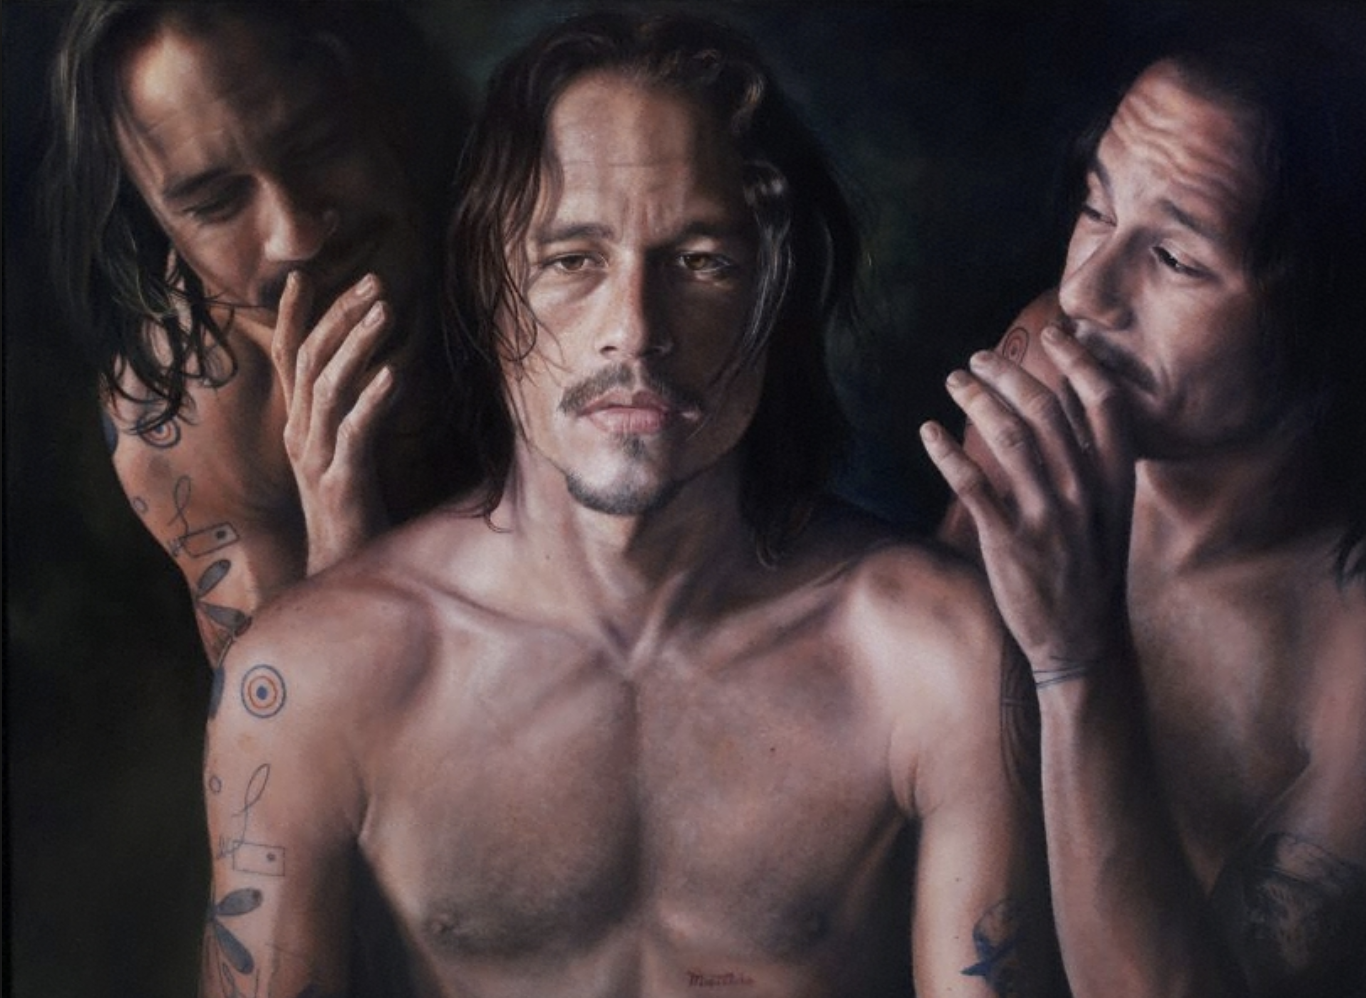 'Heath' by Vincent Fantauzzo